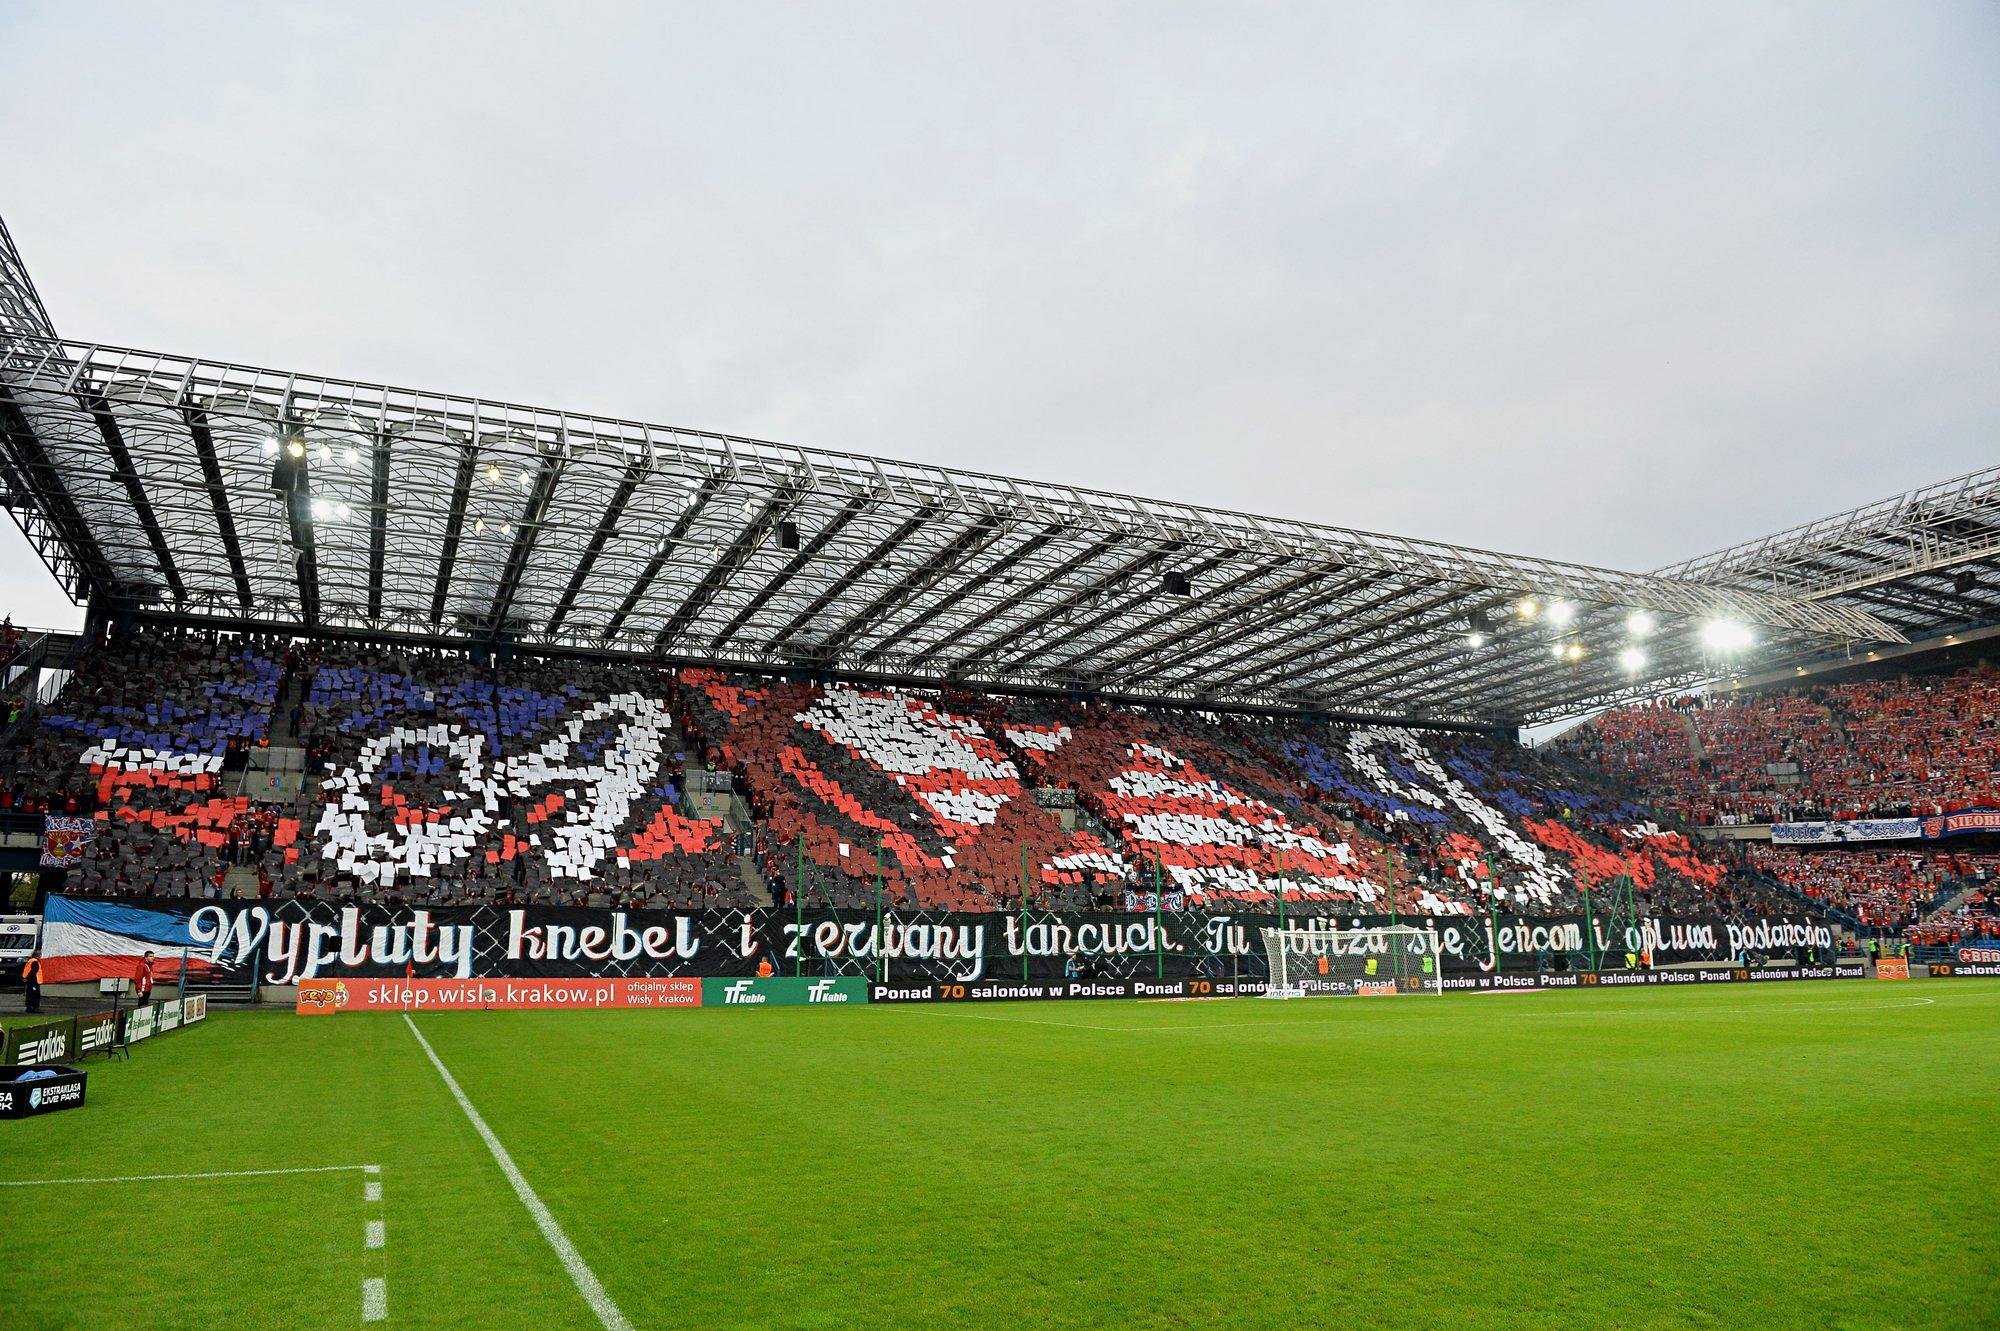 Wisla Krakow: Legia Warszawa 21.09.2014, All Cops Are